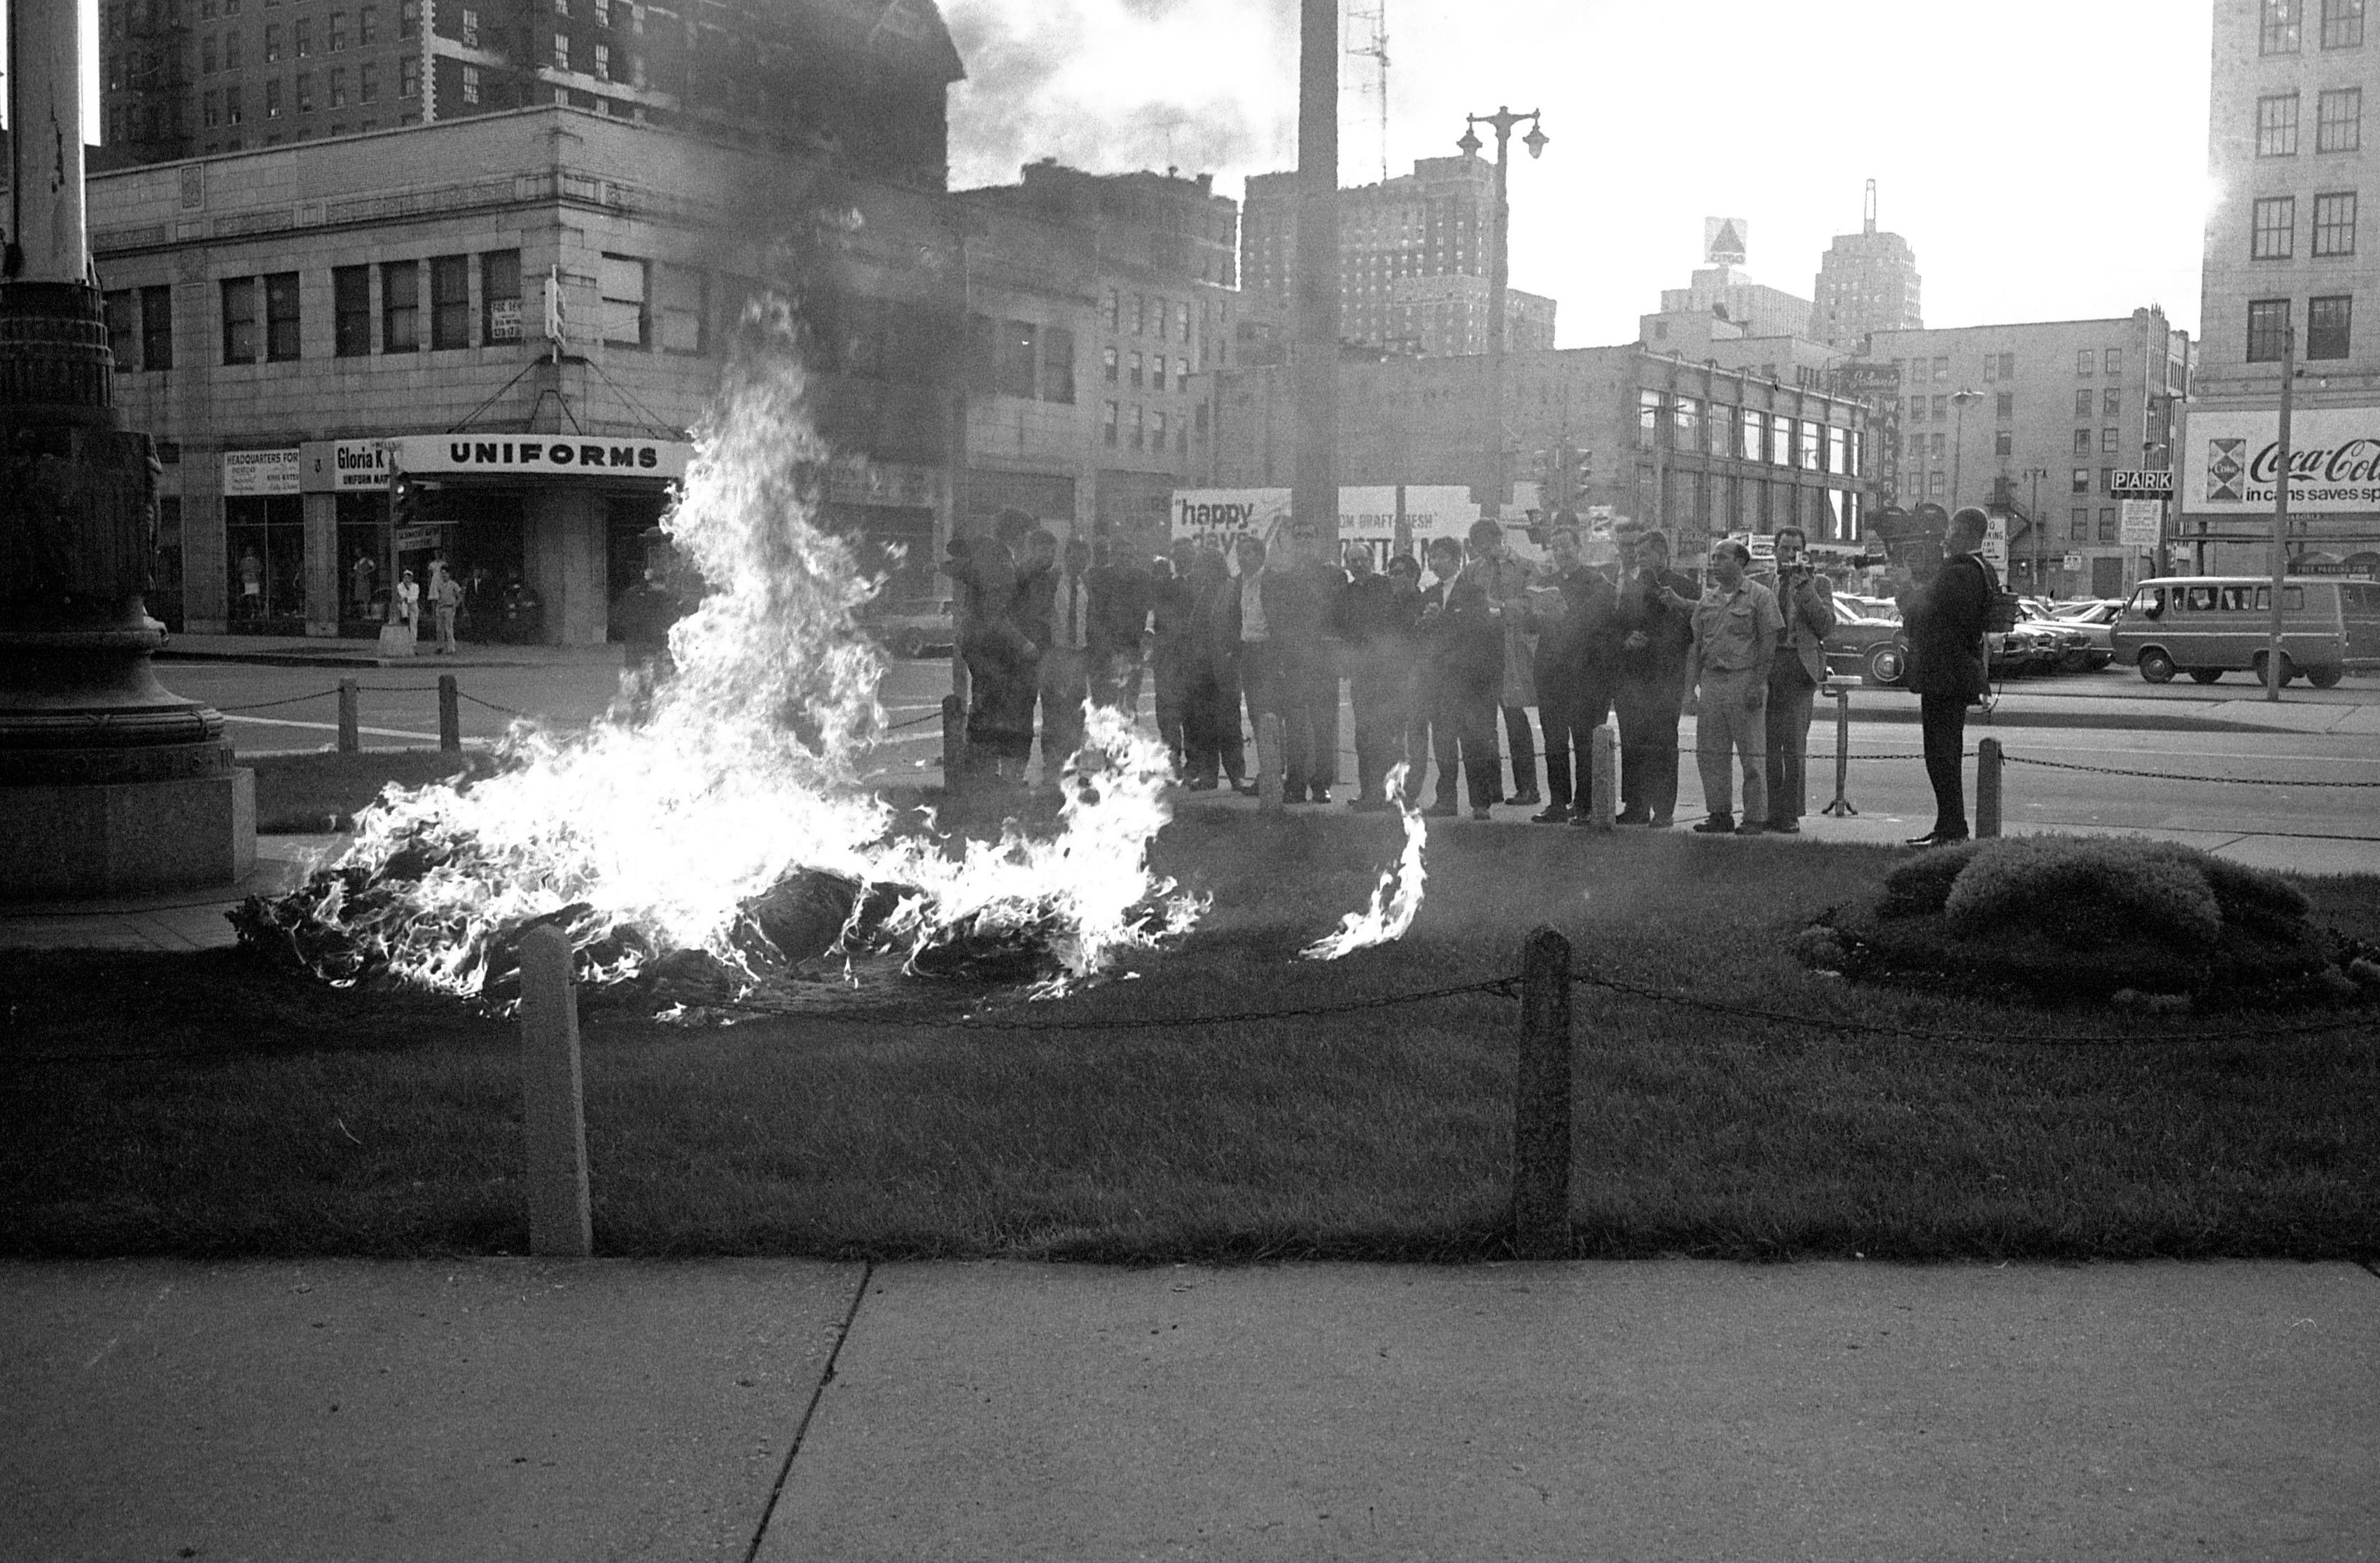 Activists gather to mark 50-year anniversary of 'Milwaukee 14' raid on draft offices | Milwaukee Journal Sentinel